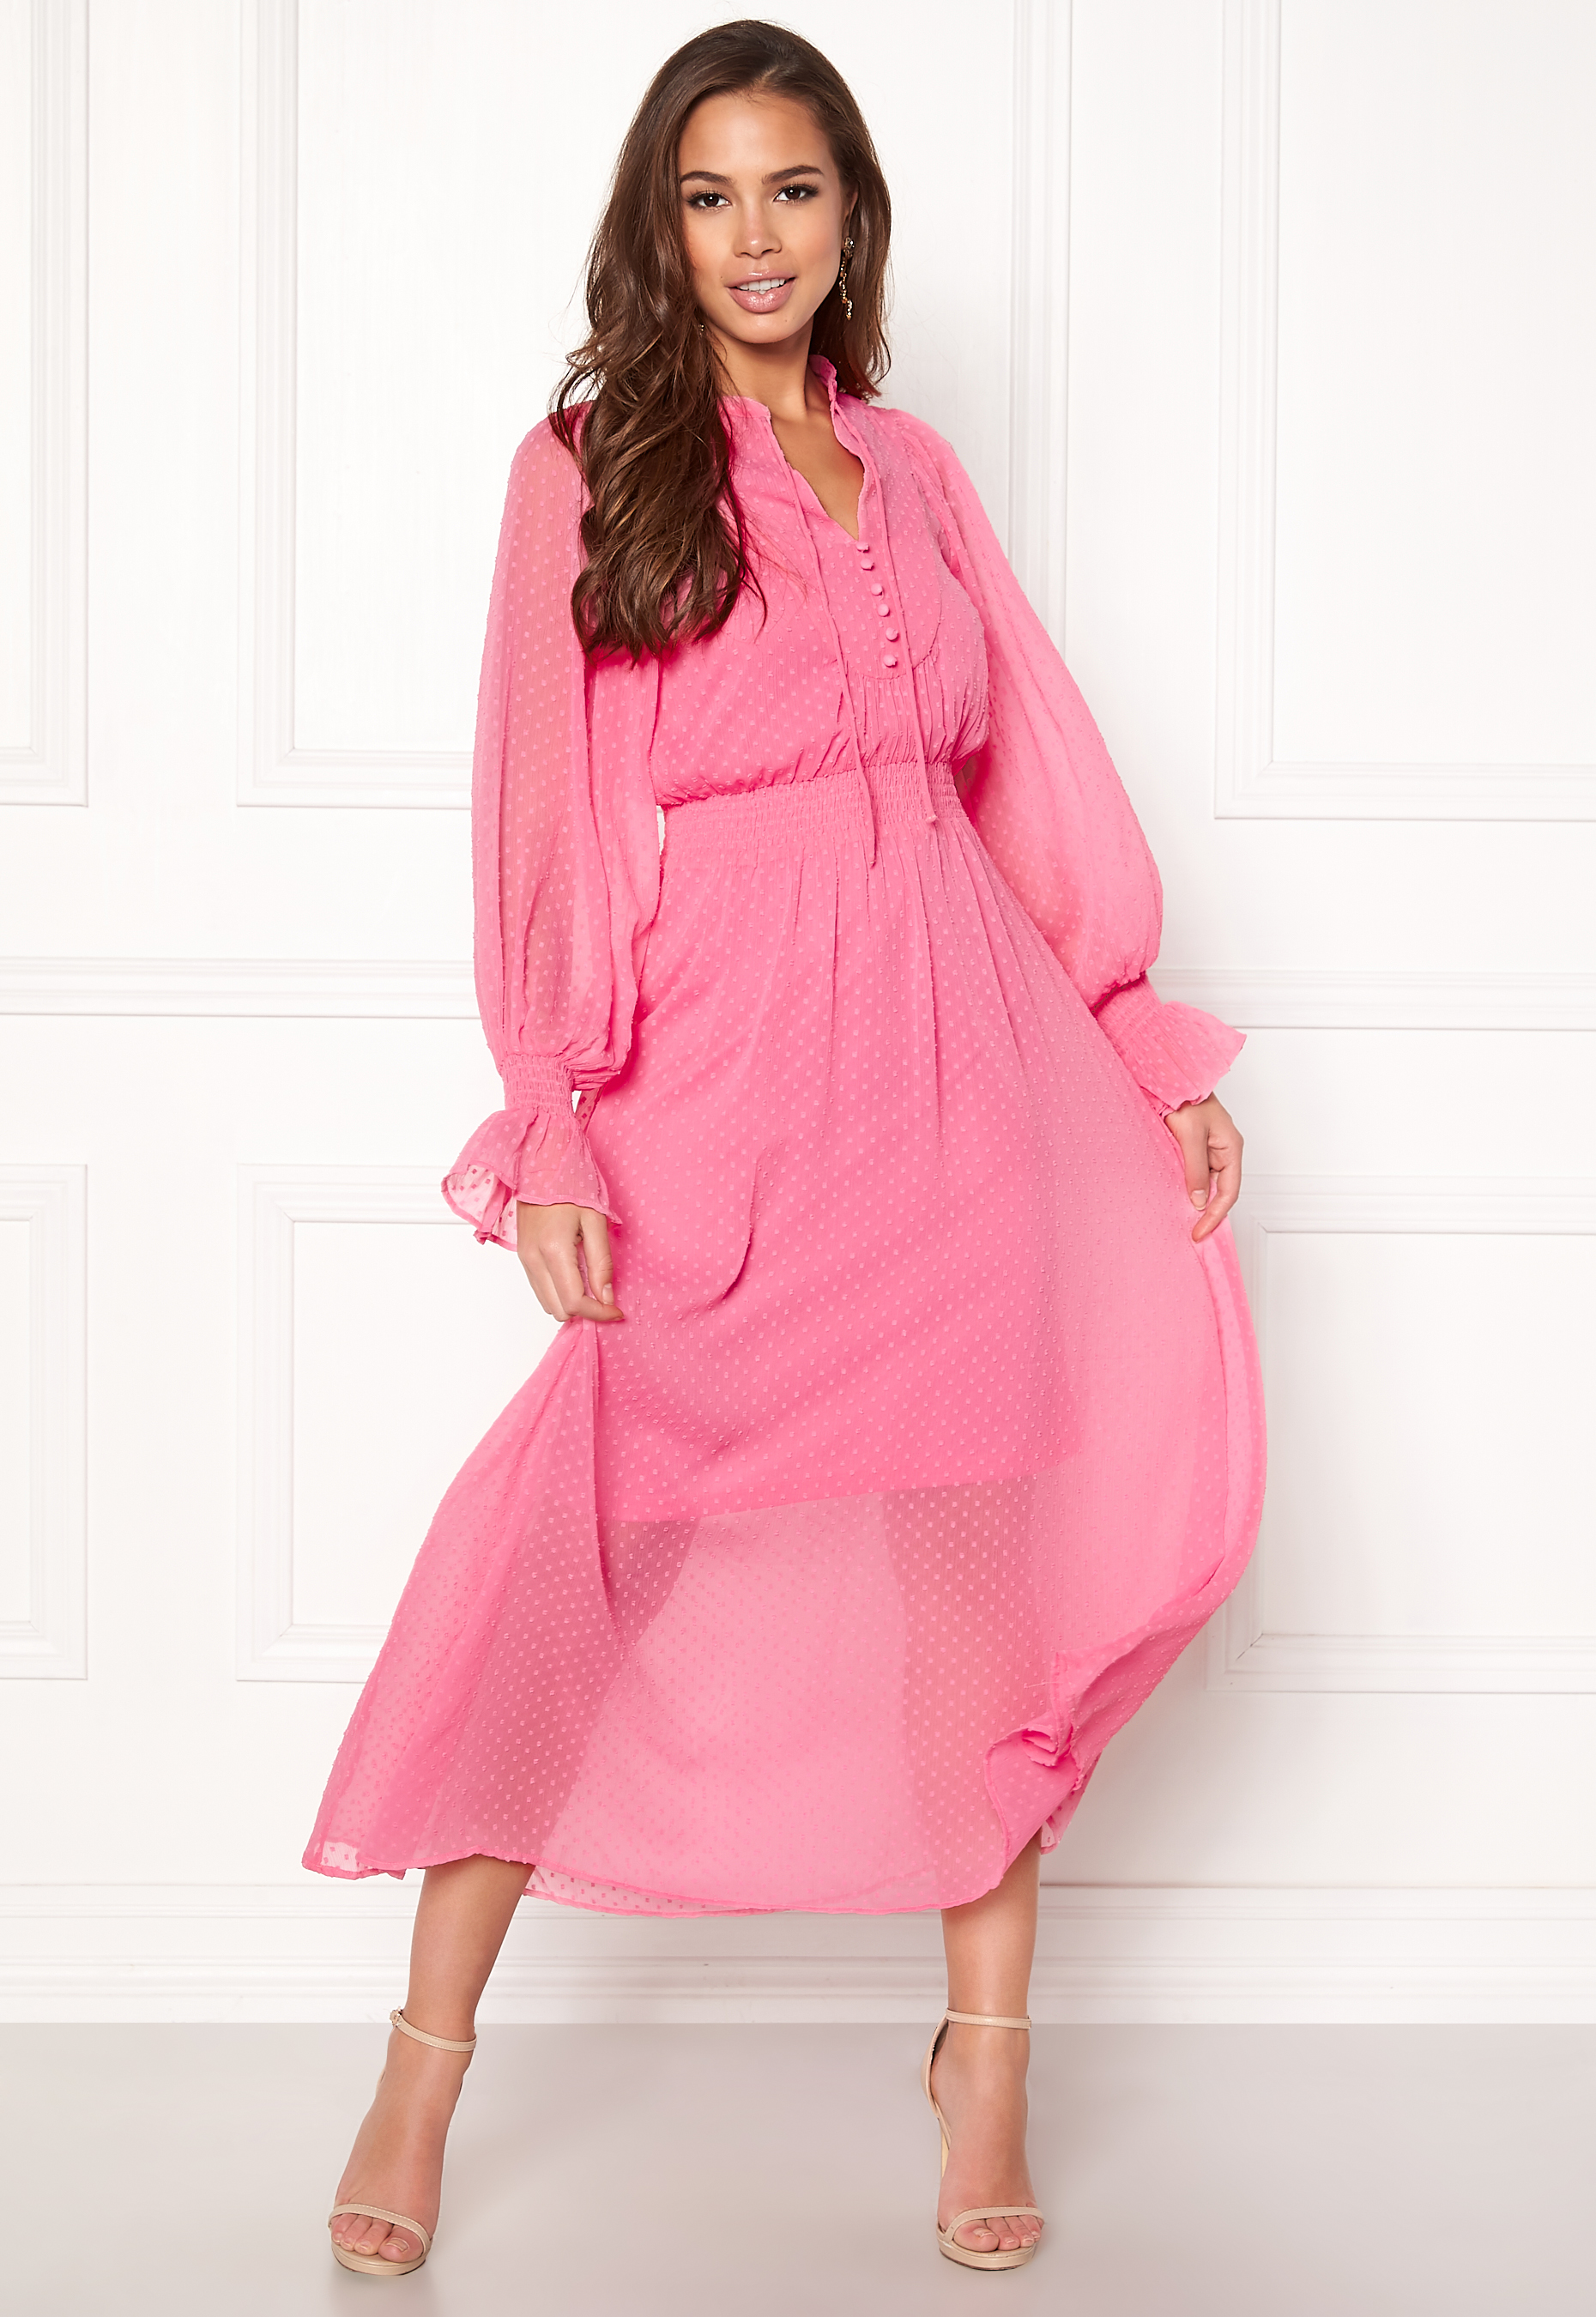 1ff861c80df2 Y s Sachet Pink Debra a Bubbleroom Ls Dress r5qOUrXx